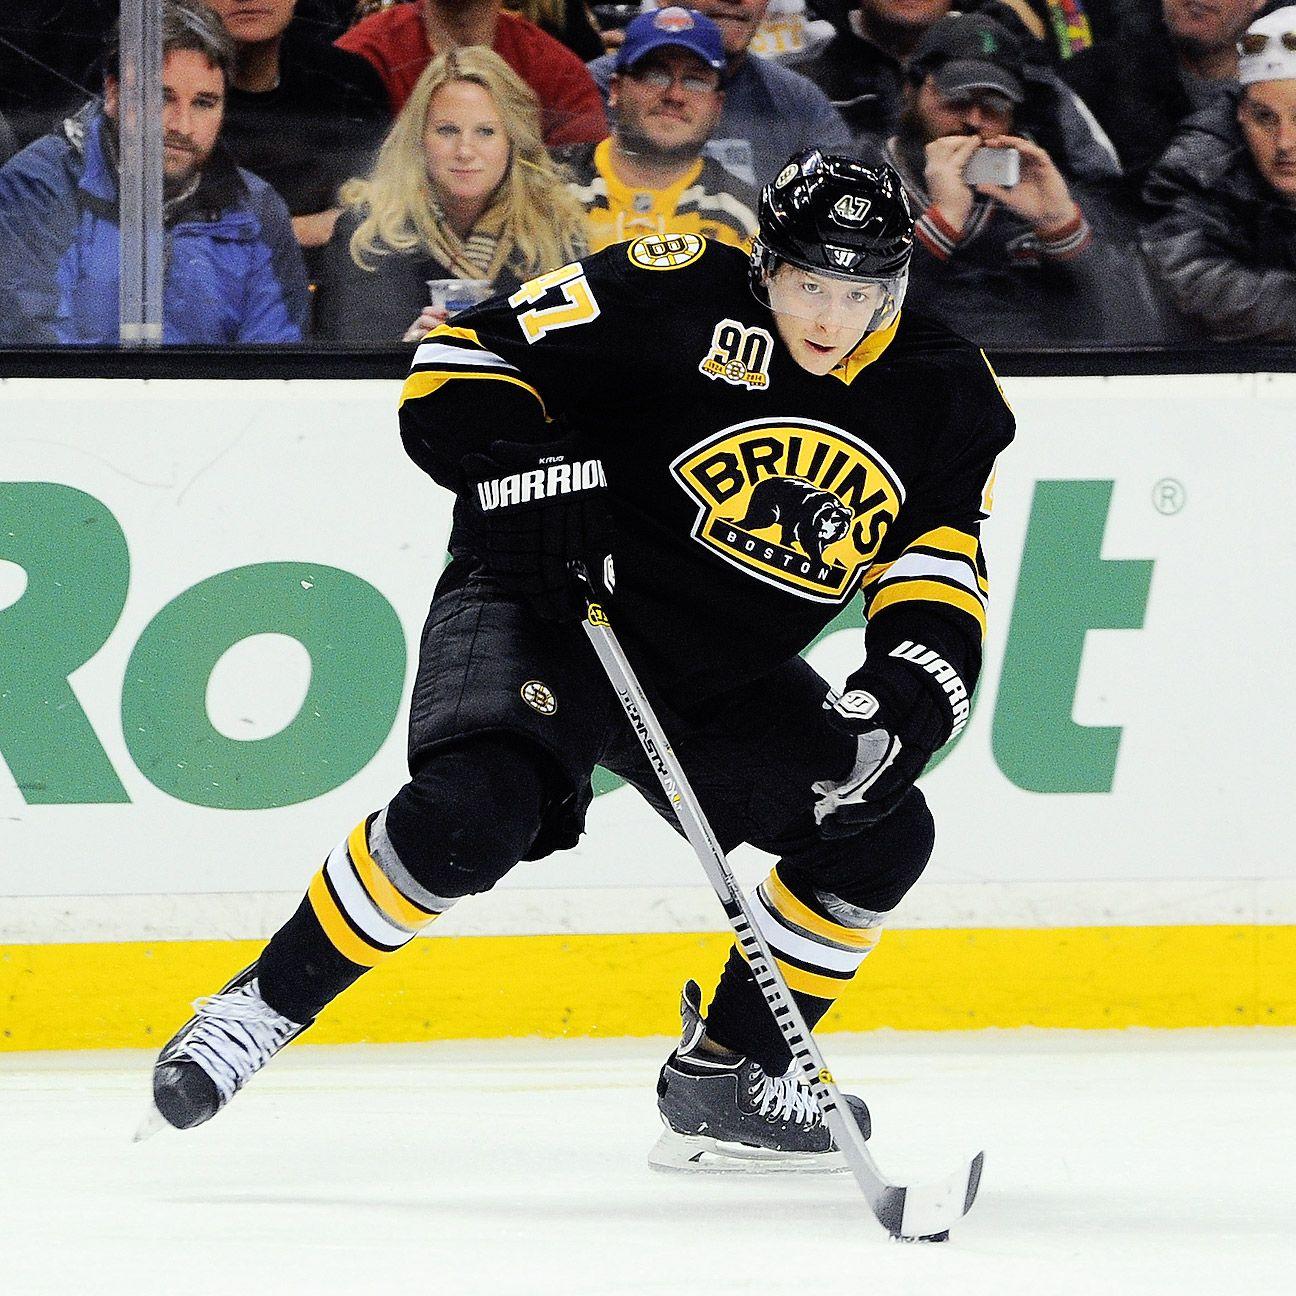 Boston Bruins Re-sign Torey Krug, Reilly Smith